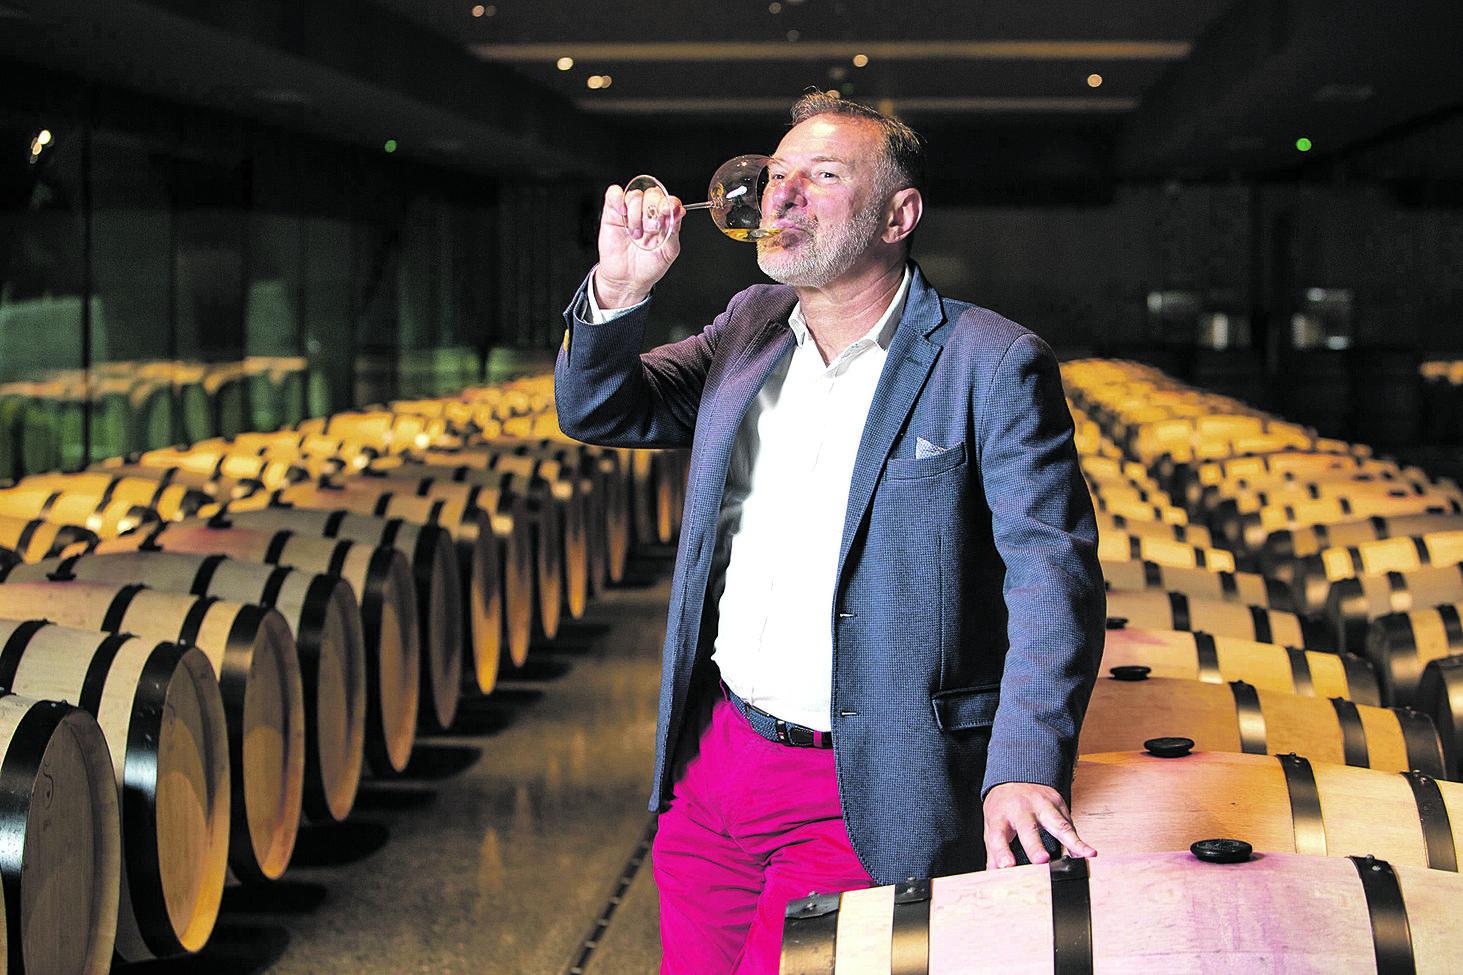 Kutjevo, 280628.  Nova vinarija Galic u Kutjevu vlasnika Josipa Galica.  Na fotografiji: Josip Galic. Foto: Vlado Kos / CROPIX